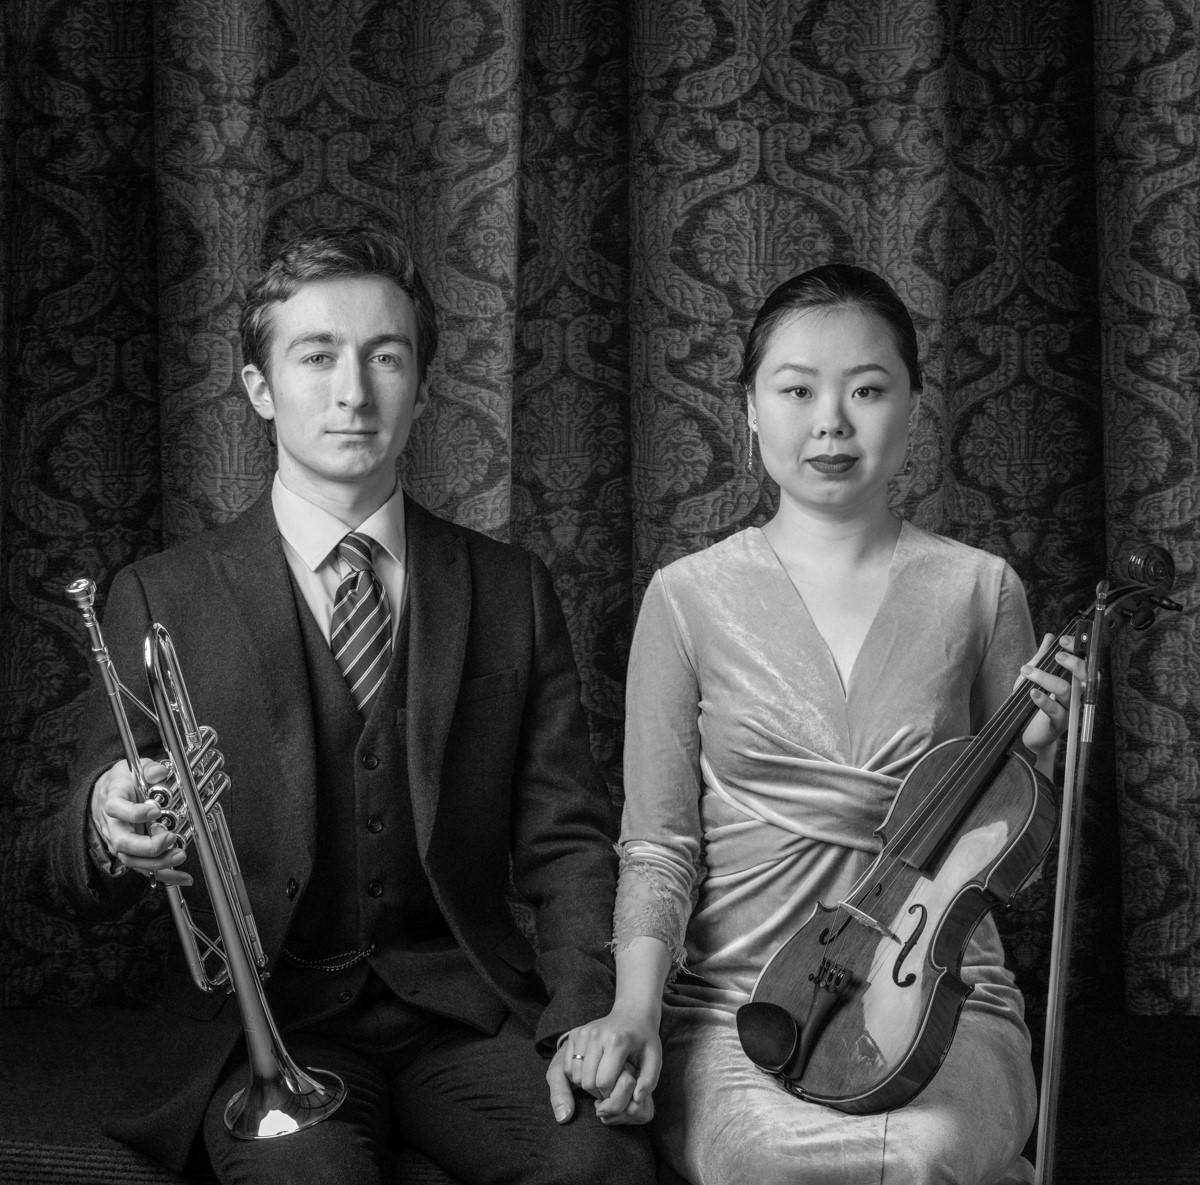 The instrumentalists